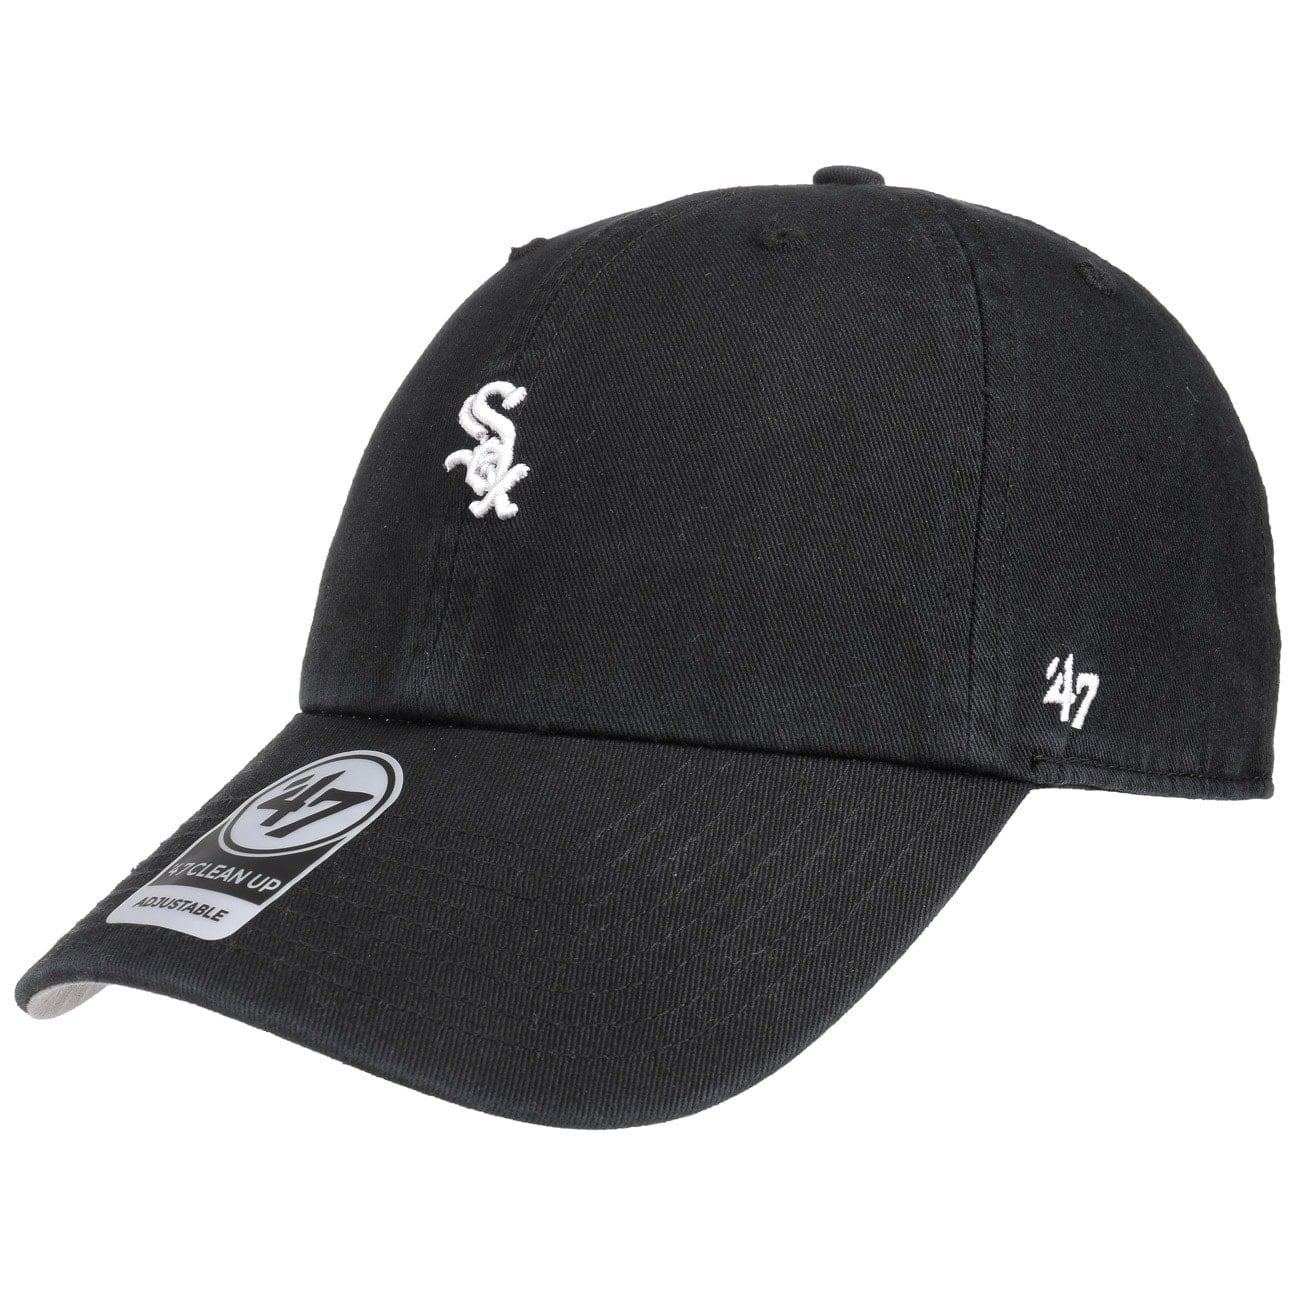 Gorra Abate White Sox by 47 Brand  gorra de baseball